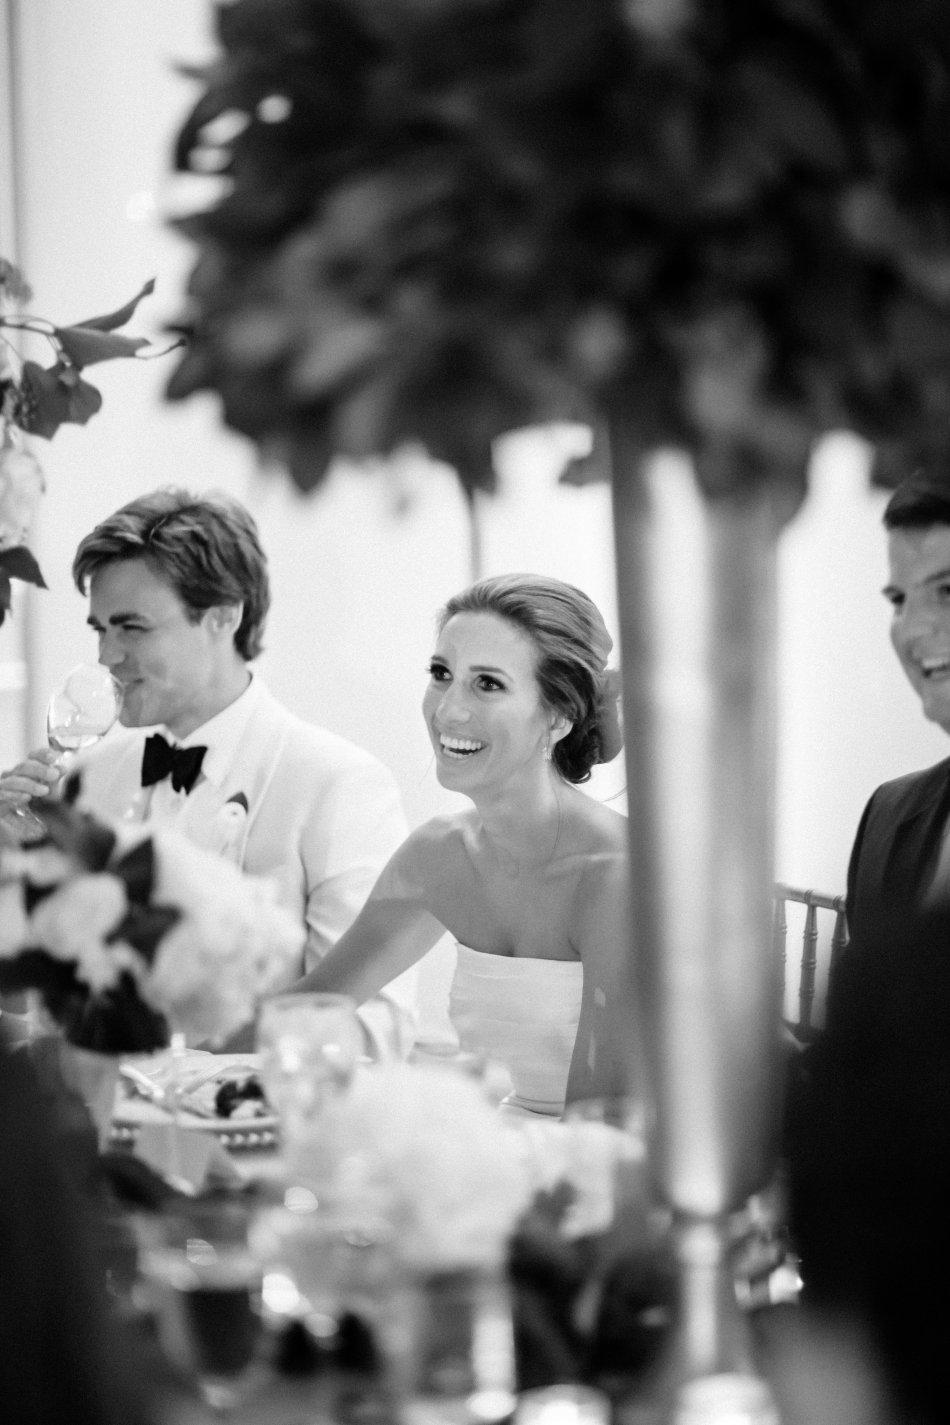 port-royal-club-luxury-wedding-photography-anna-lucia-events_0510.jpg